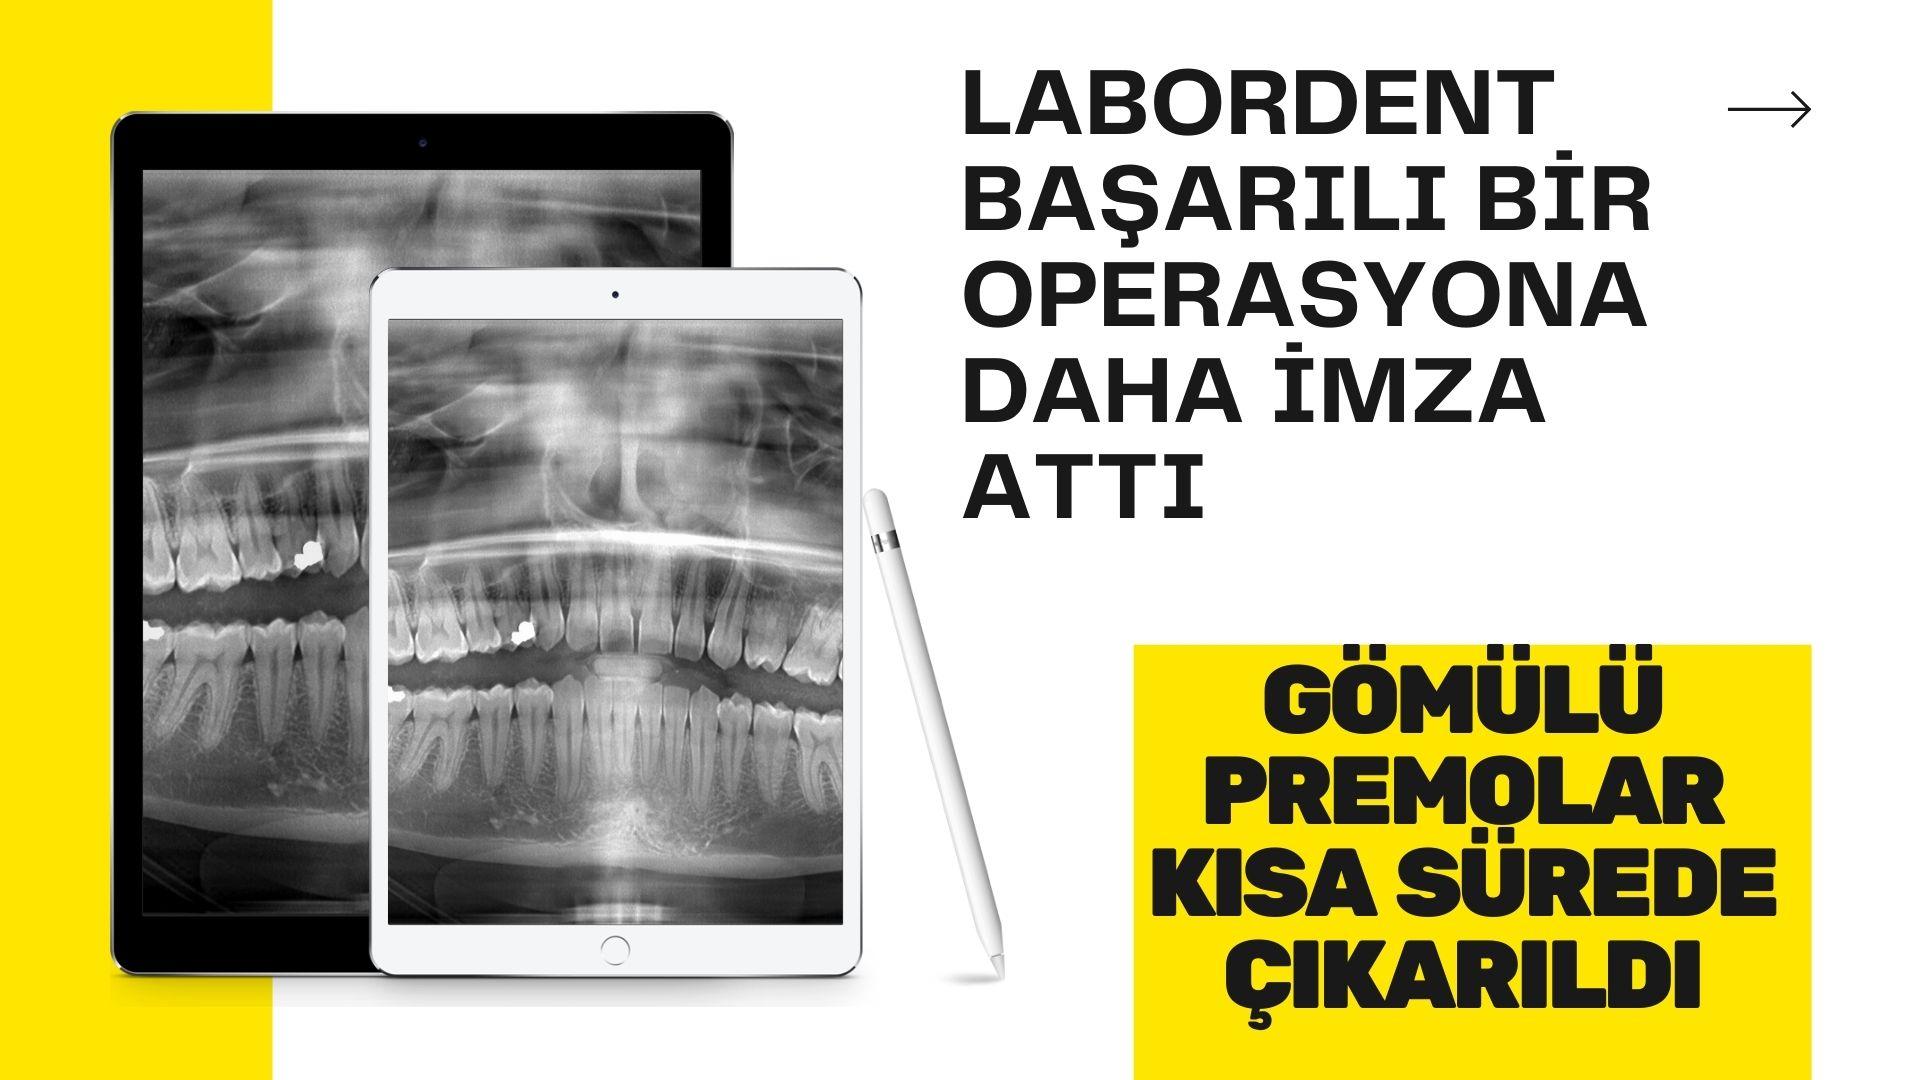 Labordent Diş Polikliniği başarılı bir operasyona imza attı